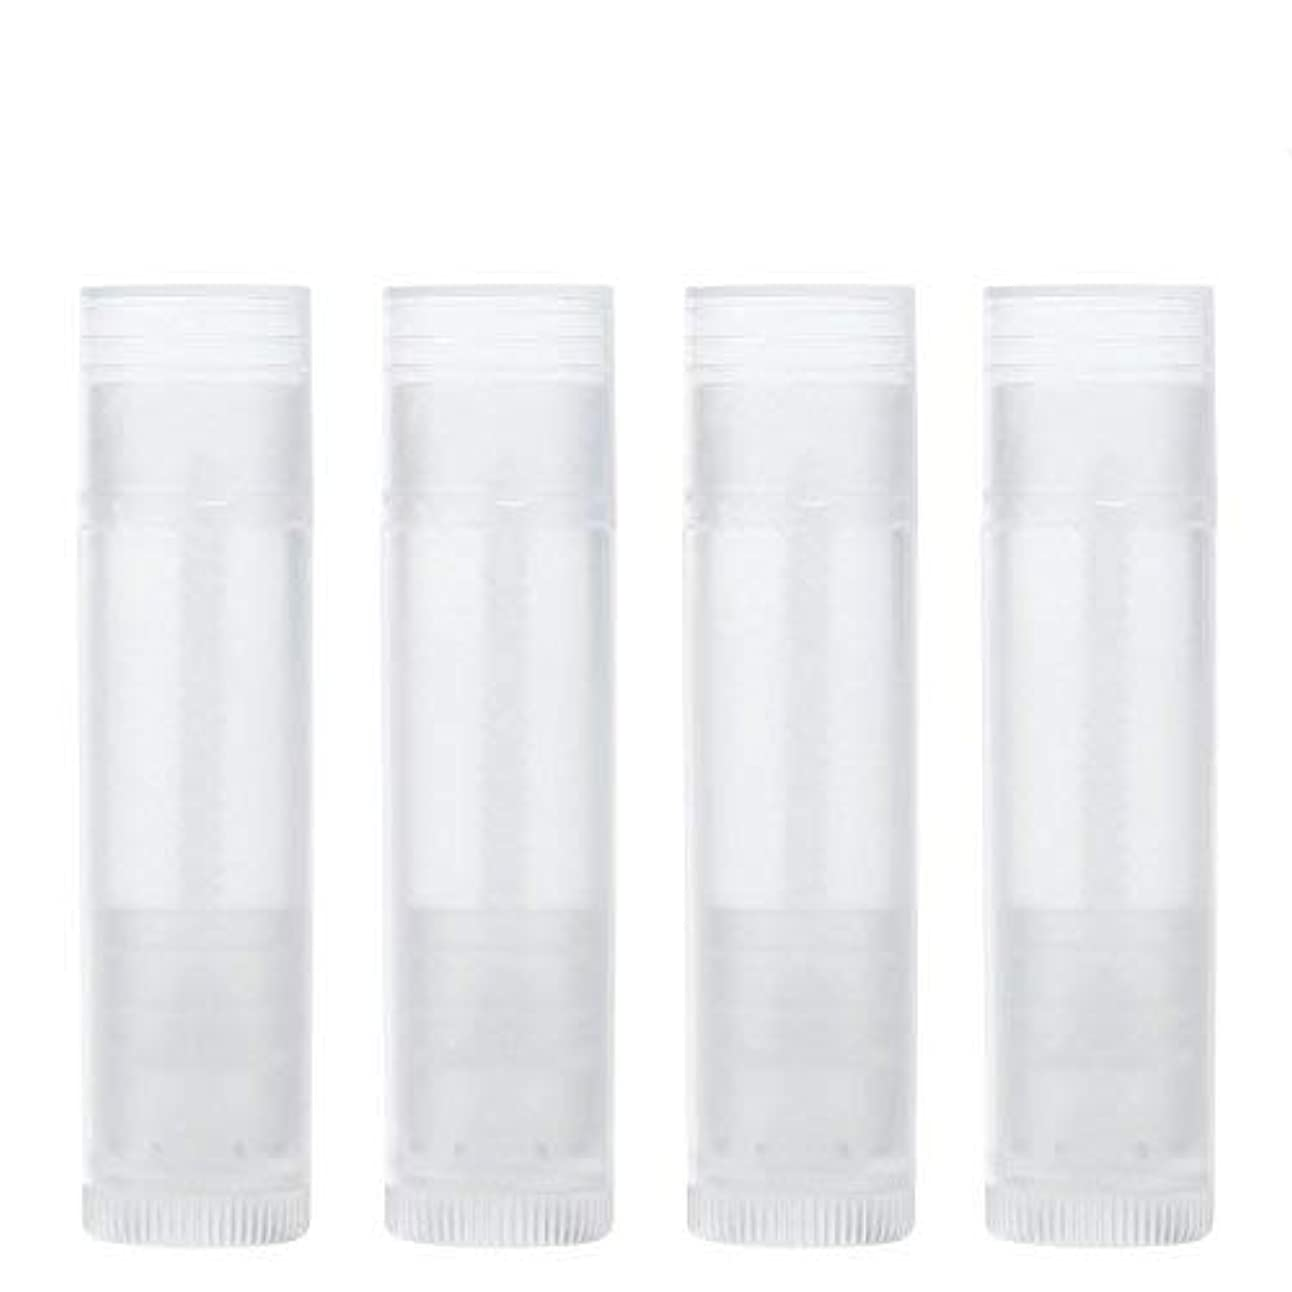 coraly リップ クリーム チューブ 空リップバームチューブ DIYチュ??ーブ 化粧品容器 口紅ボトル 口紅 詰替容器 10個